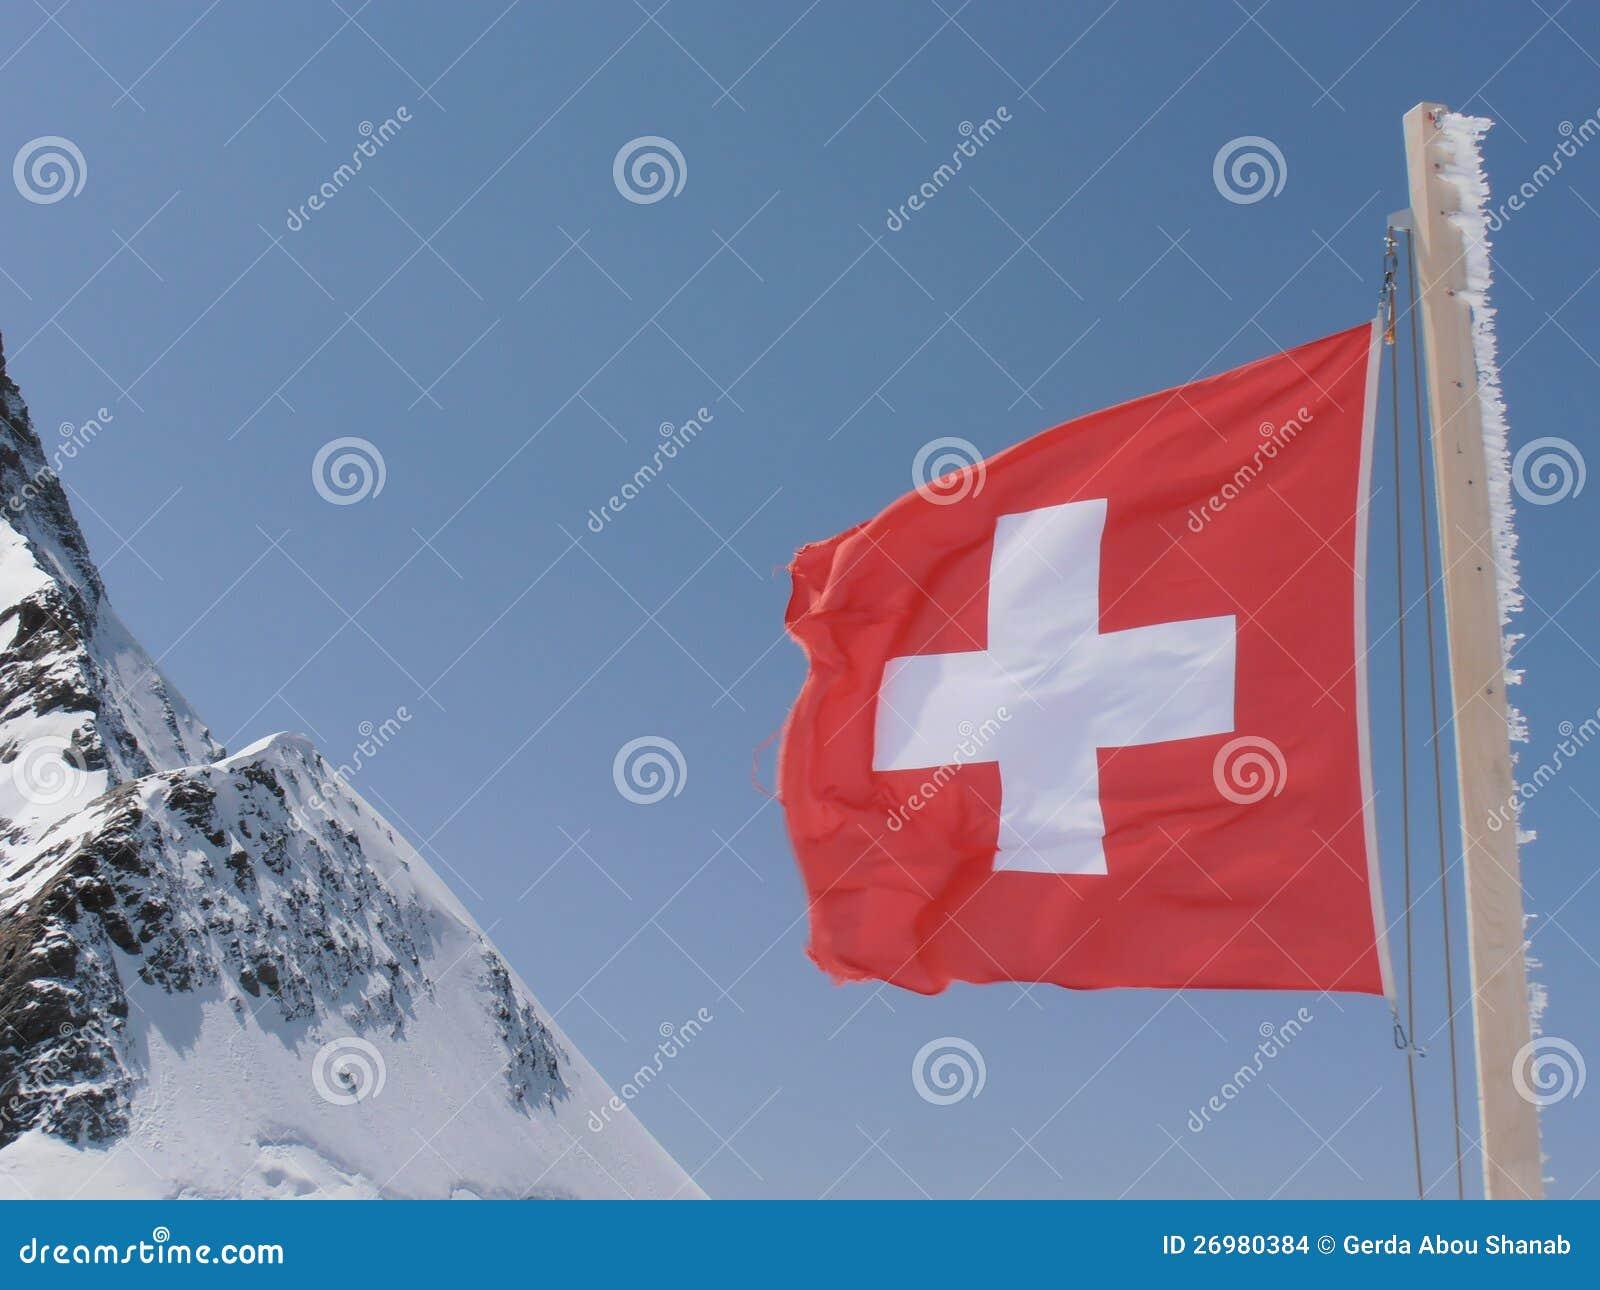 Jungfraujoch die Schweiz